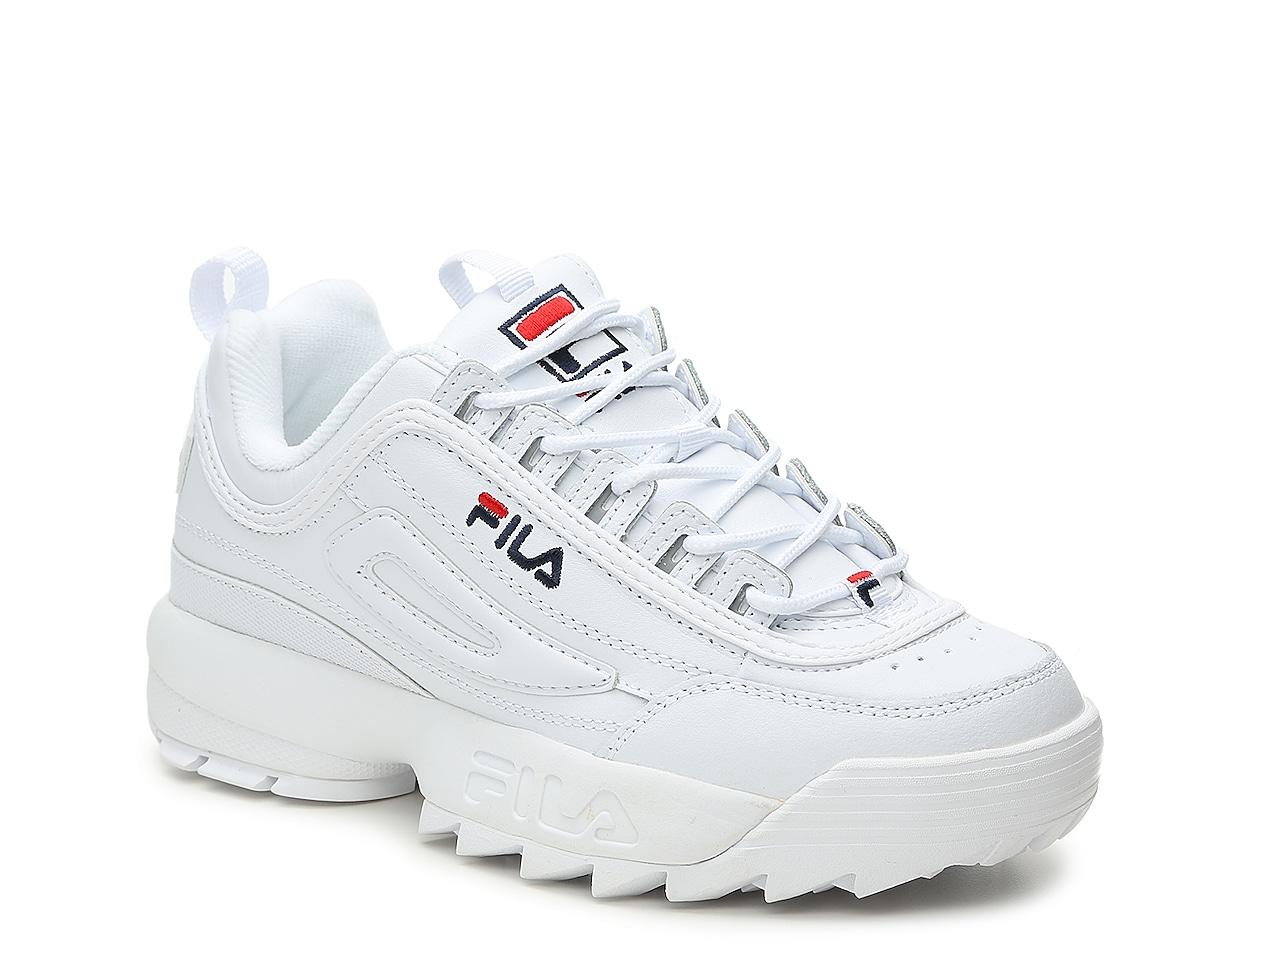 Sociedad préstamo Frente a ti  Fila Disruptor II Premium Sneaker - Women's Women's Shoes | DSW